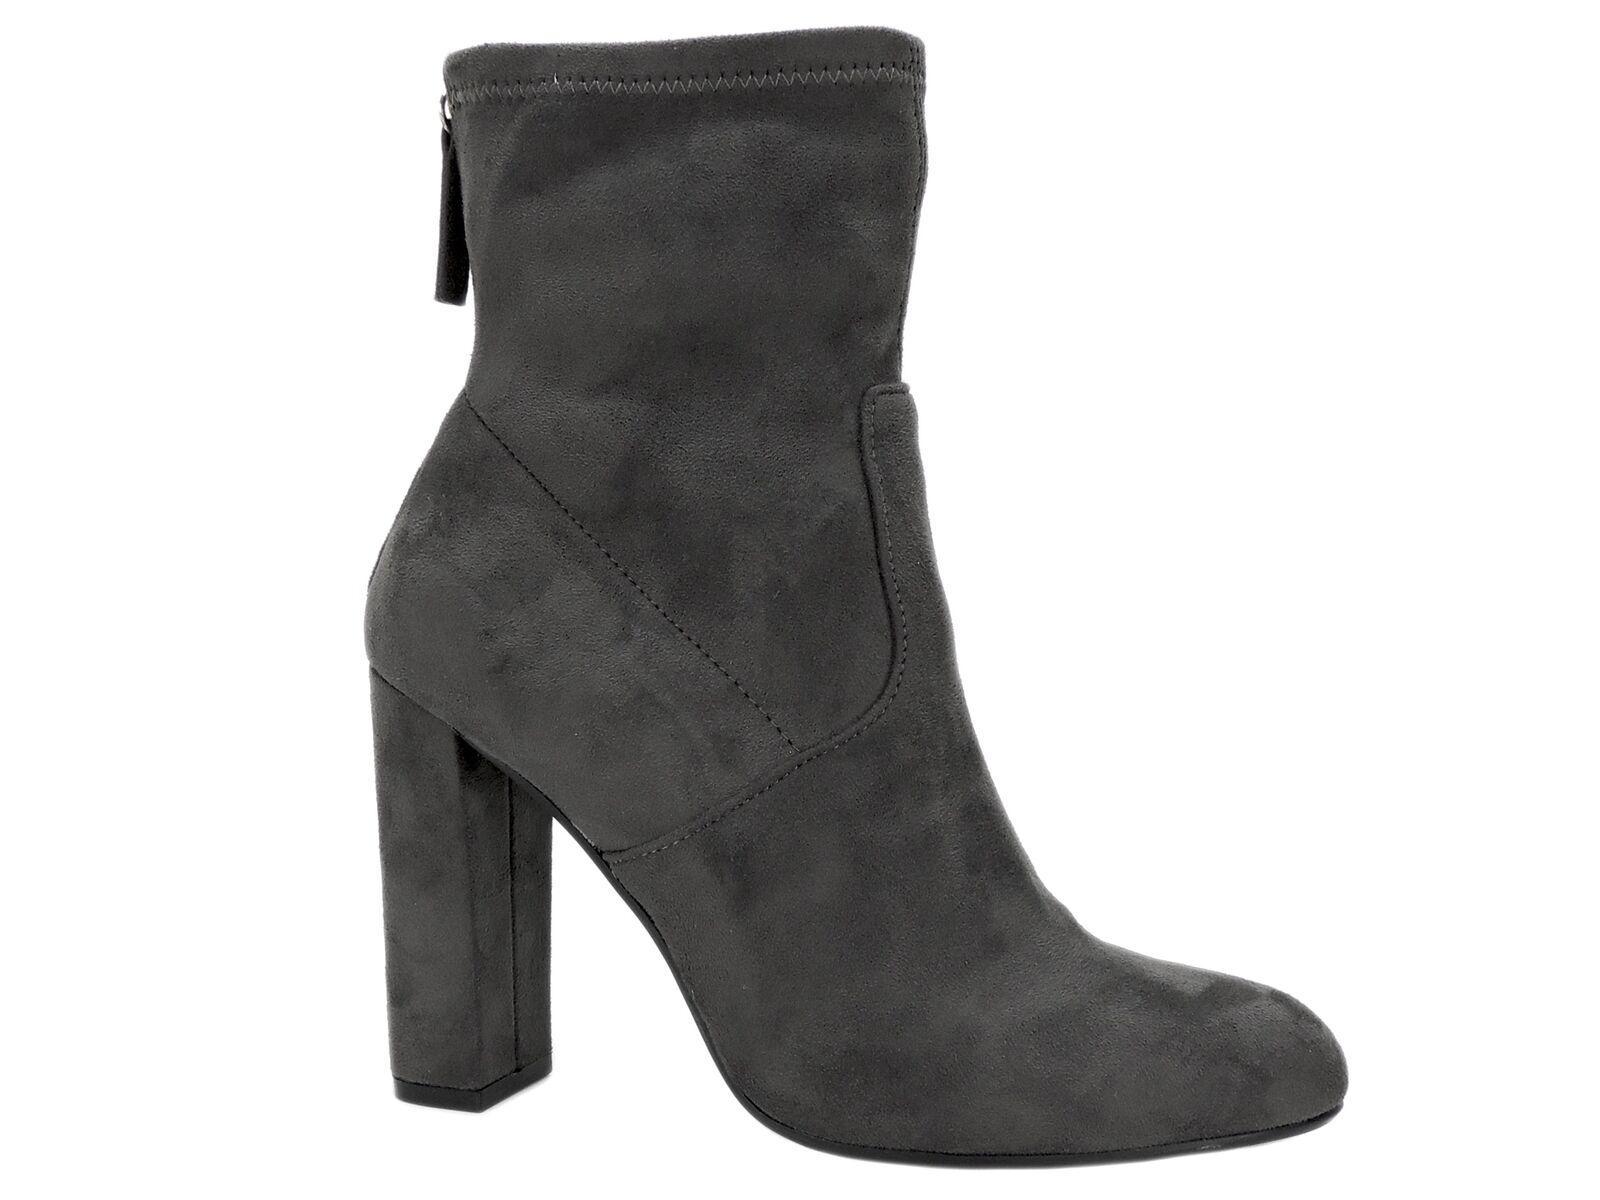 Steve Madden Women's Brisk Block-Heel Sock Booties Grey Size Size Size 5.5 M 7ff56e